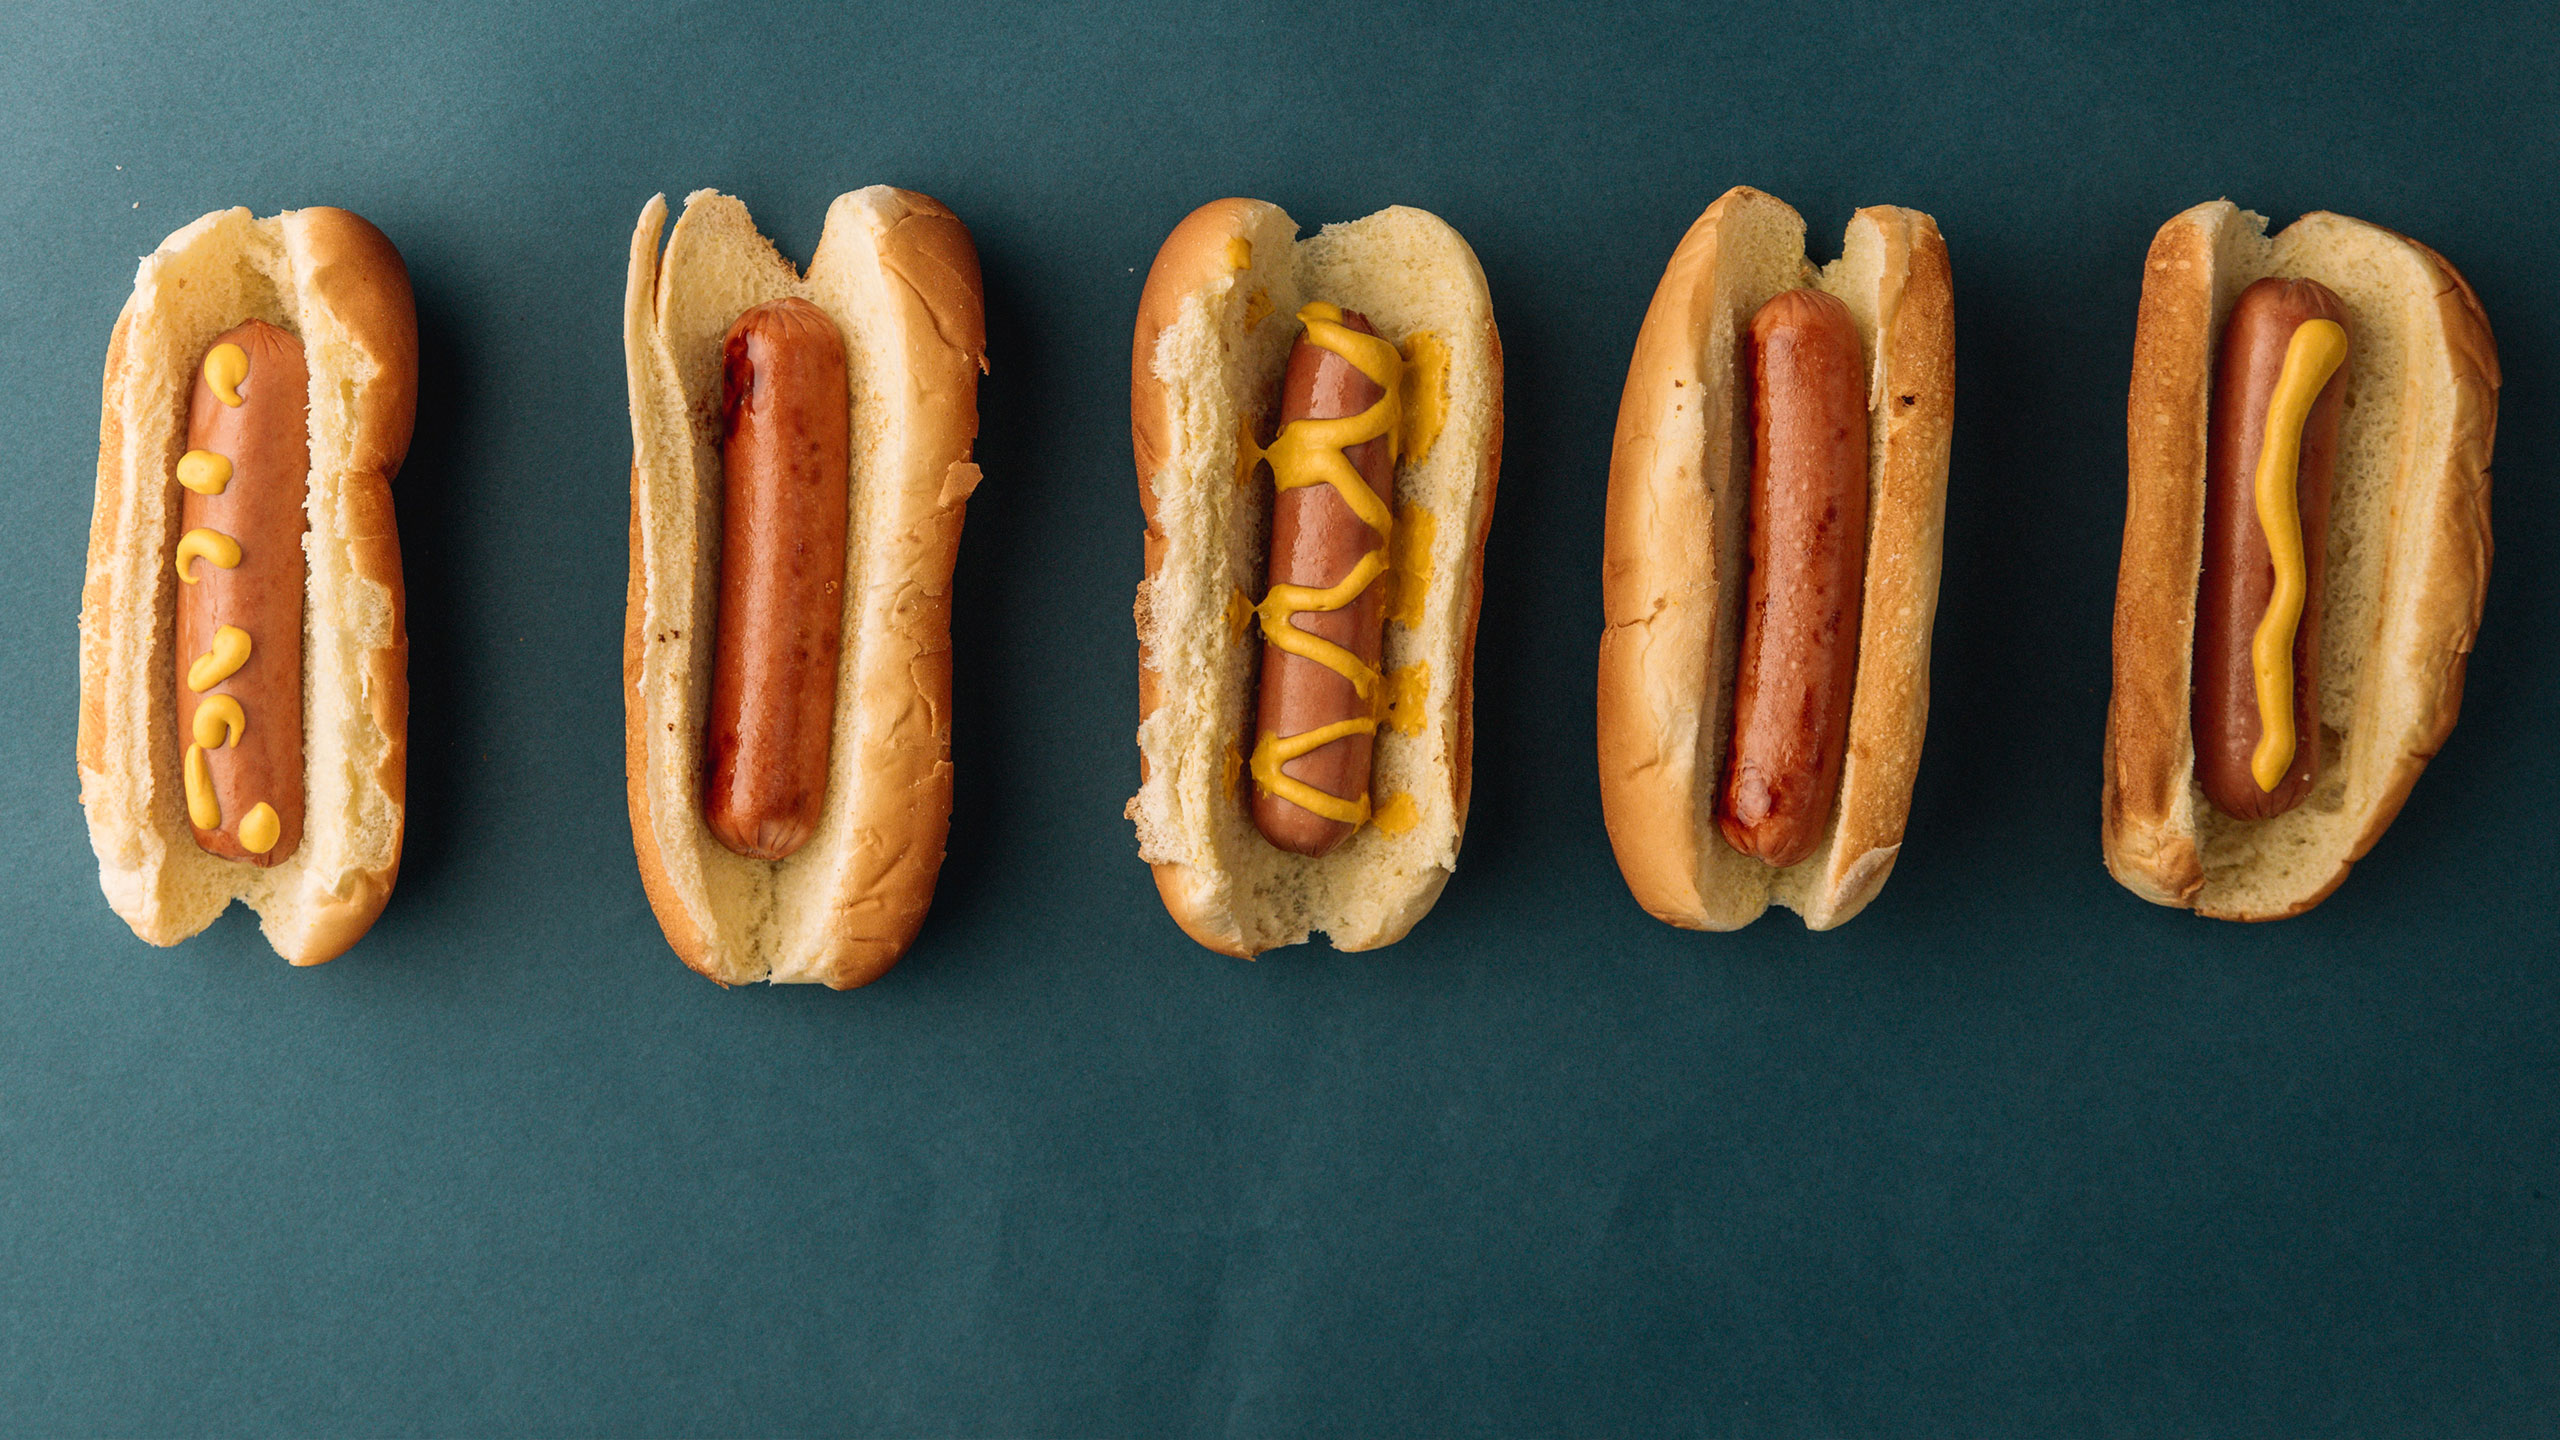 hot-dog-minutos-de-vida